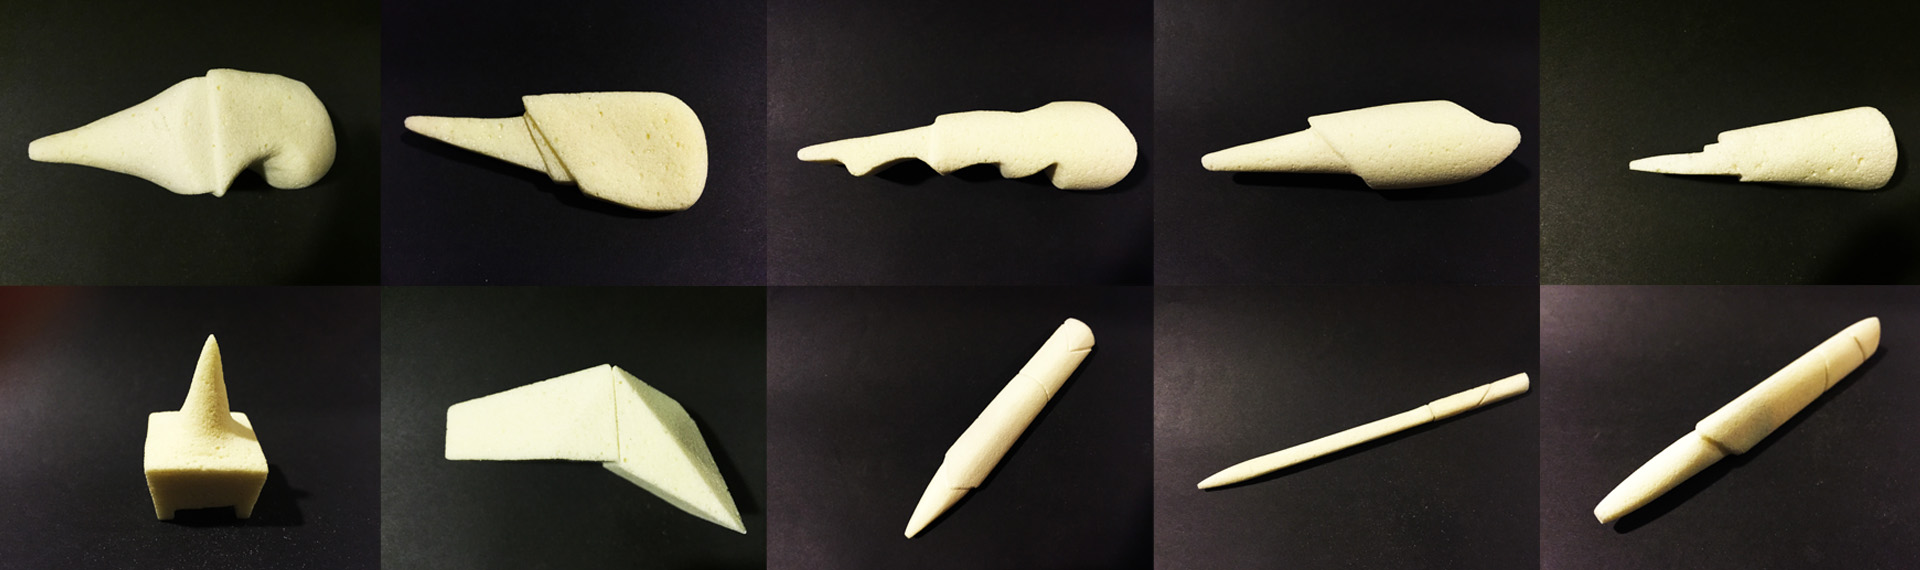 Initial foam models show form development.